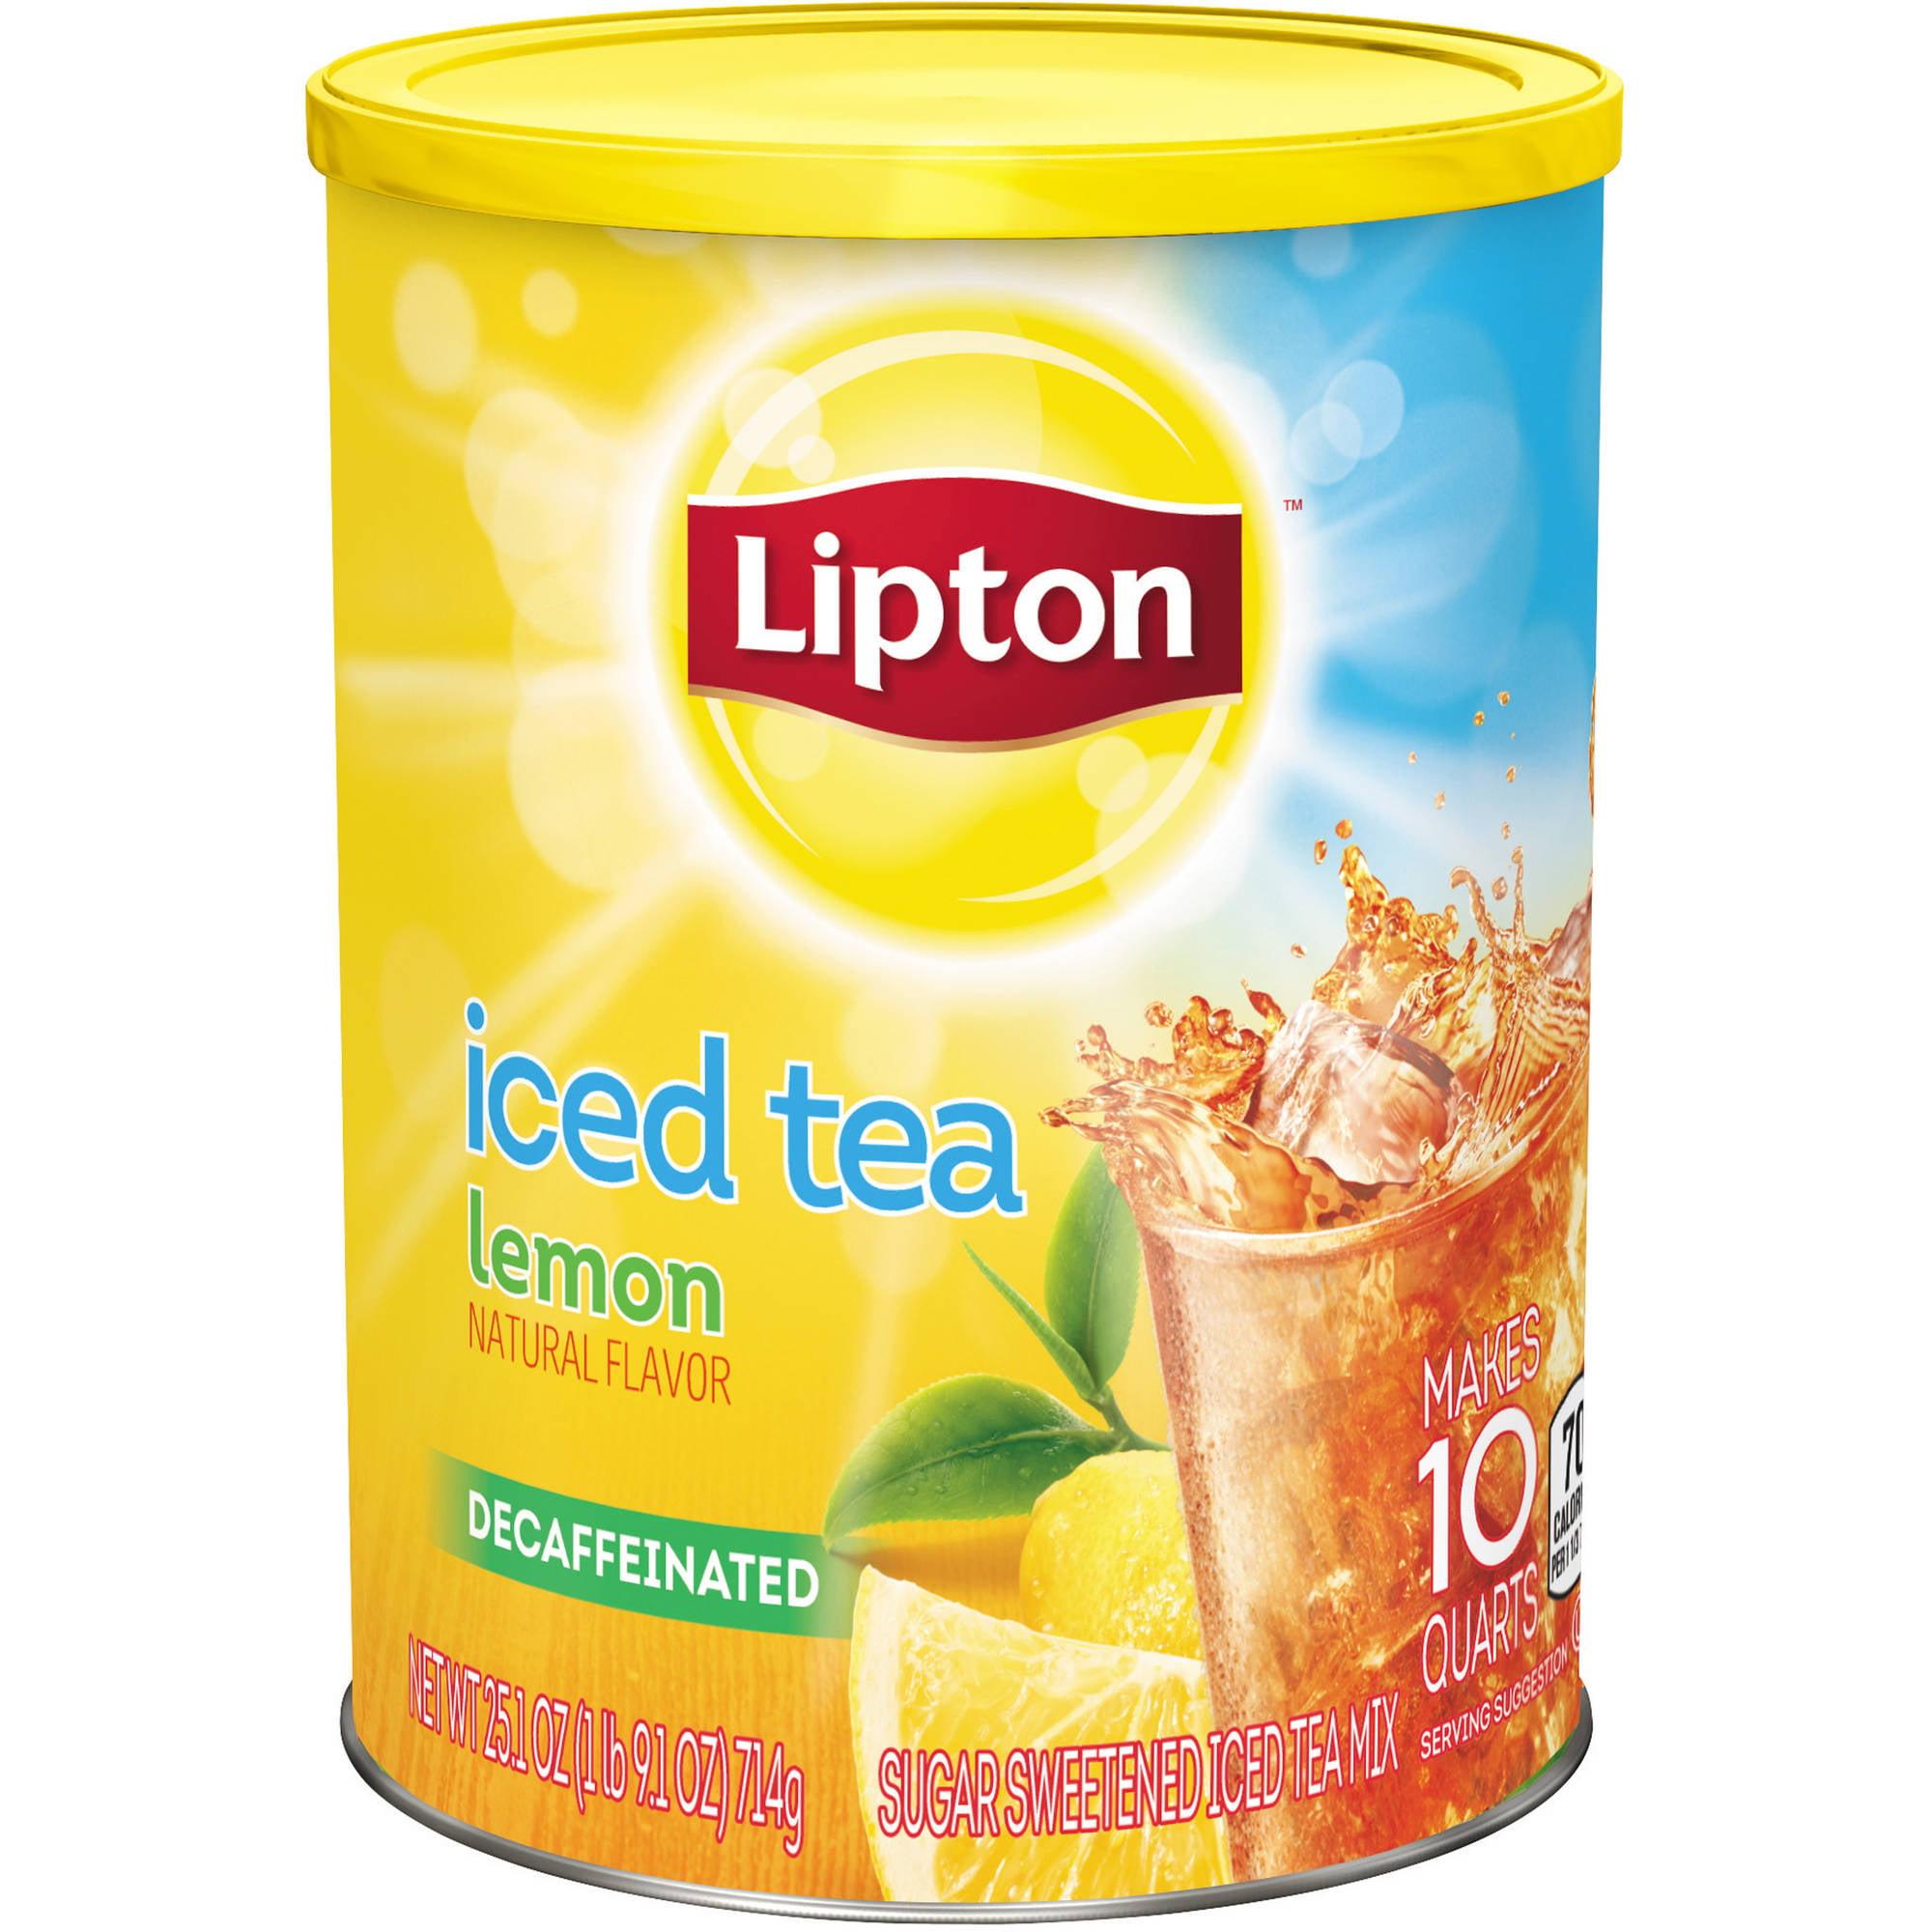 Lipton Decaffeinated Lemon Sweetened Iced Tea Mix, 10 qt